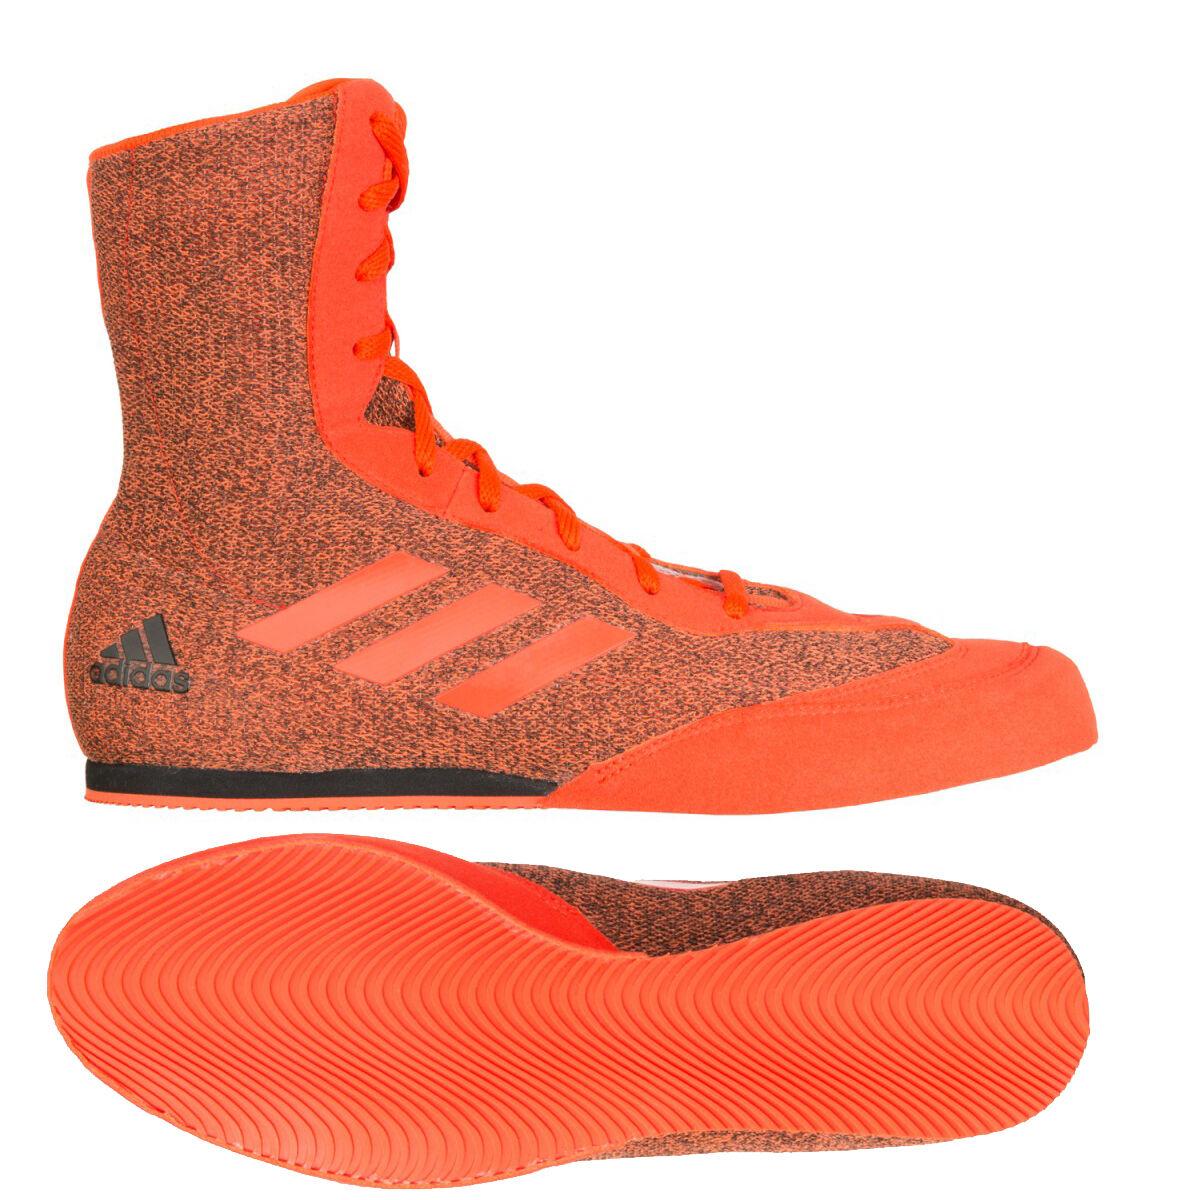 New   adidas Box Hog 3 Boxing shoes  factory direct